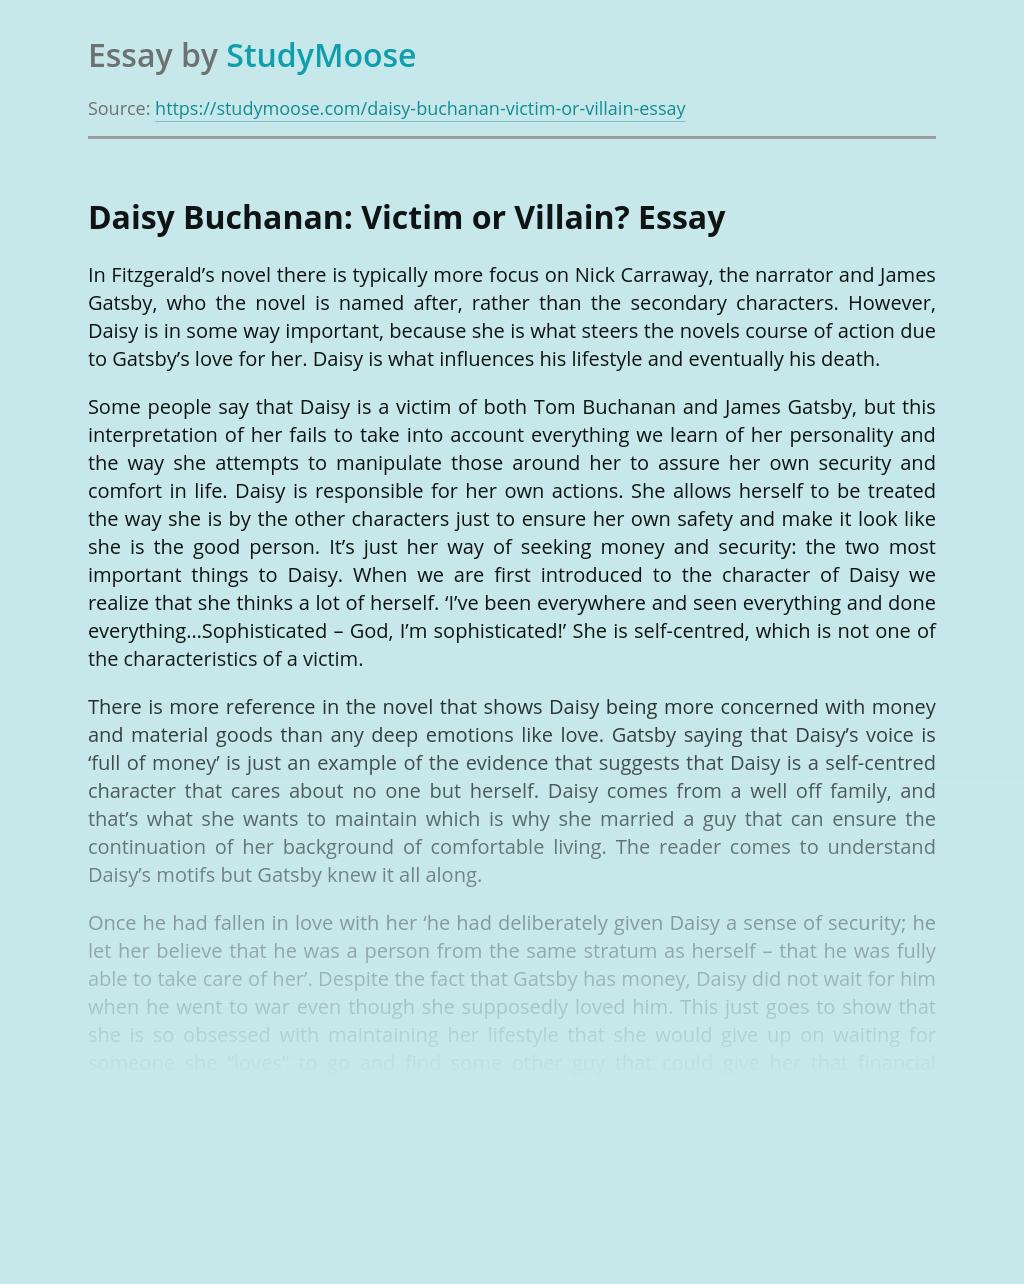 Character Daisy Buchanan is Victim or Villain